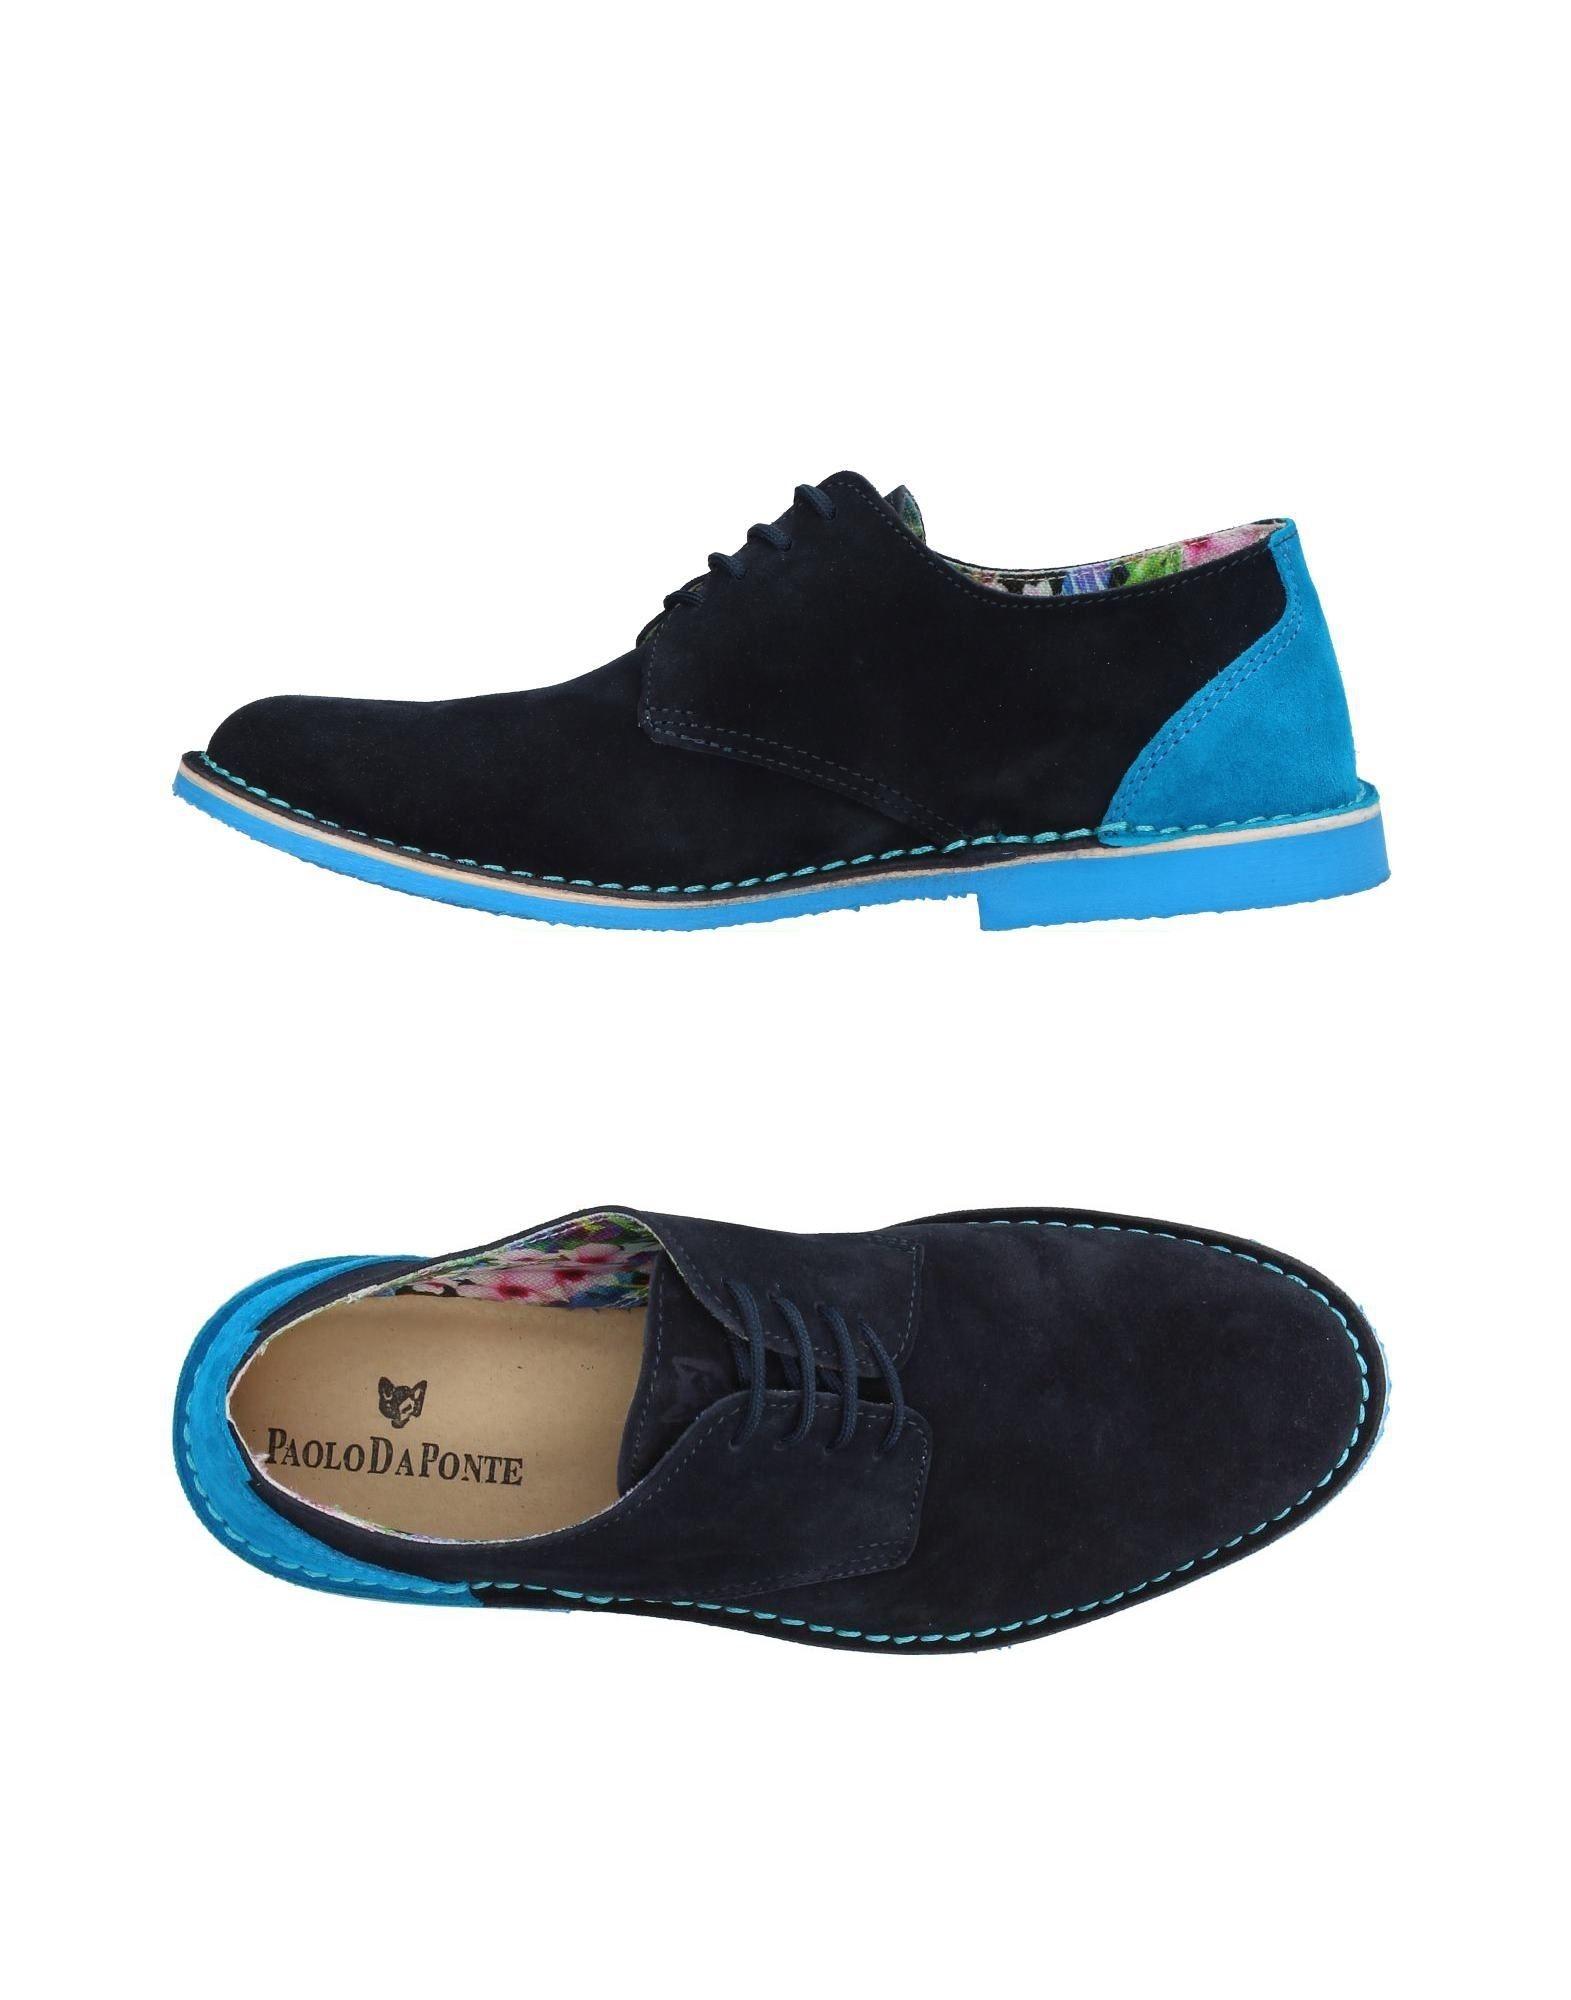 PAOLO DA PONTE Обувь на шнурках все цены